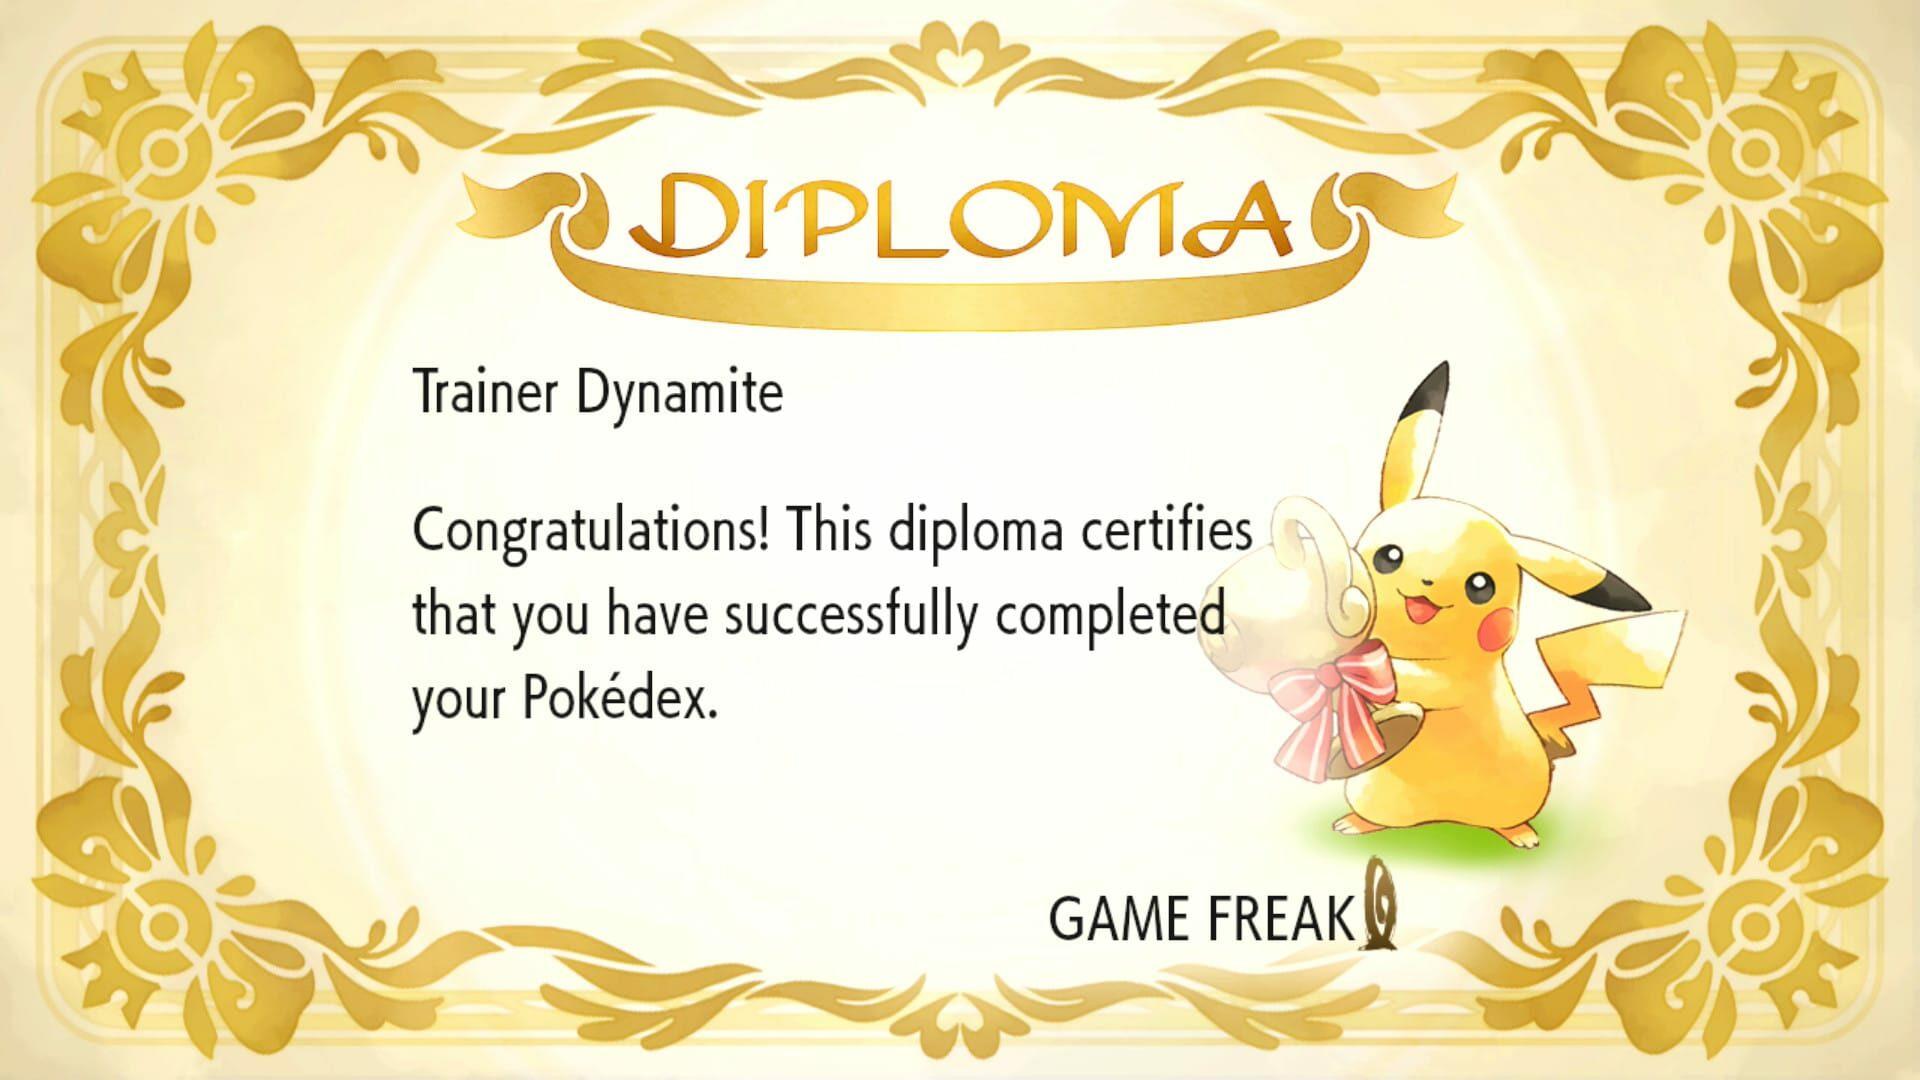 Pokédex completion diploma from Pokémon: Let's Go, Pikachu!